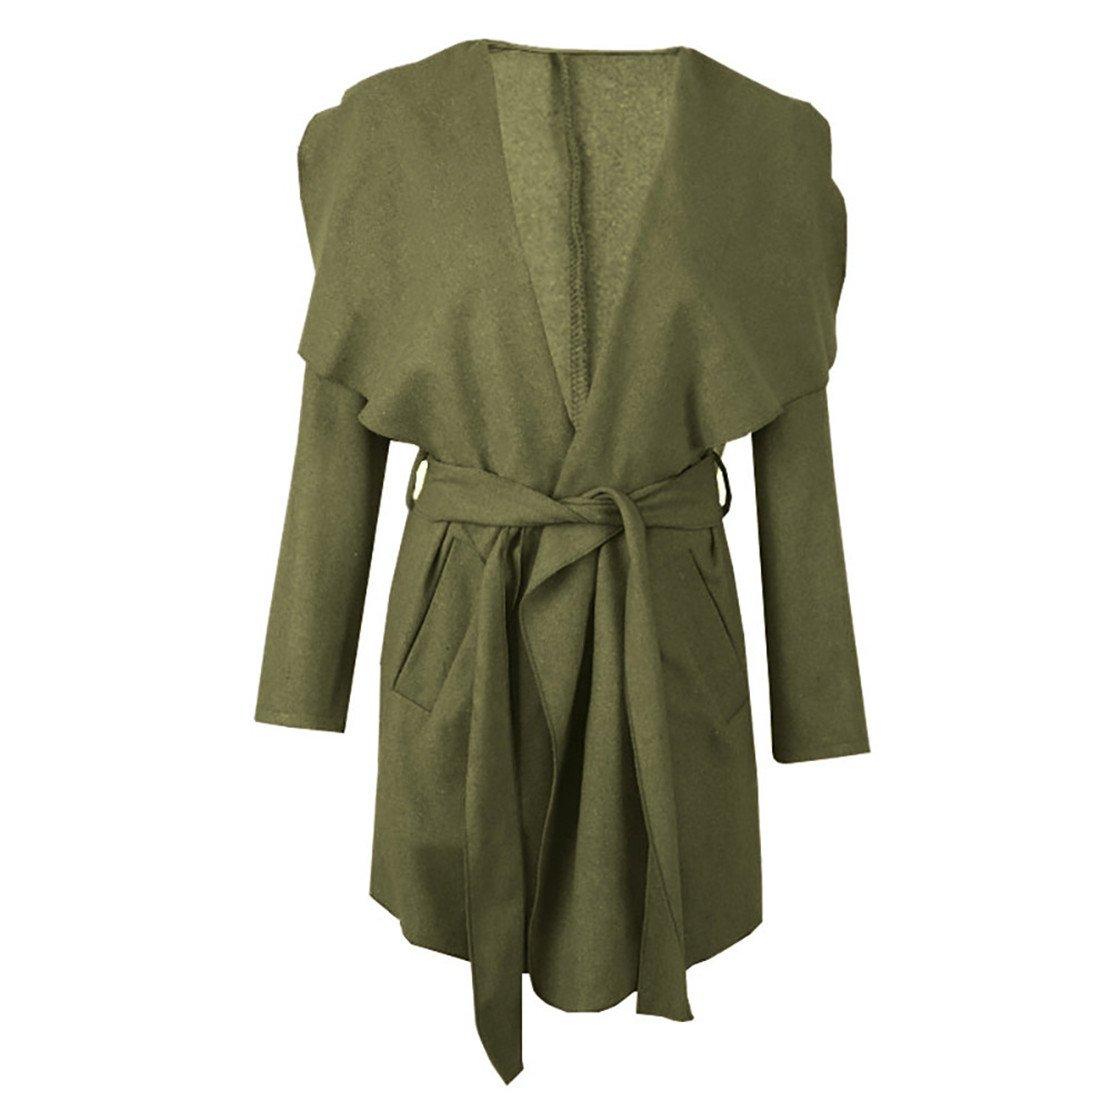 Mose Clearance Fashion Women Winter Long Sleeve Warm Long Coat With Belt (Green, S)